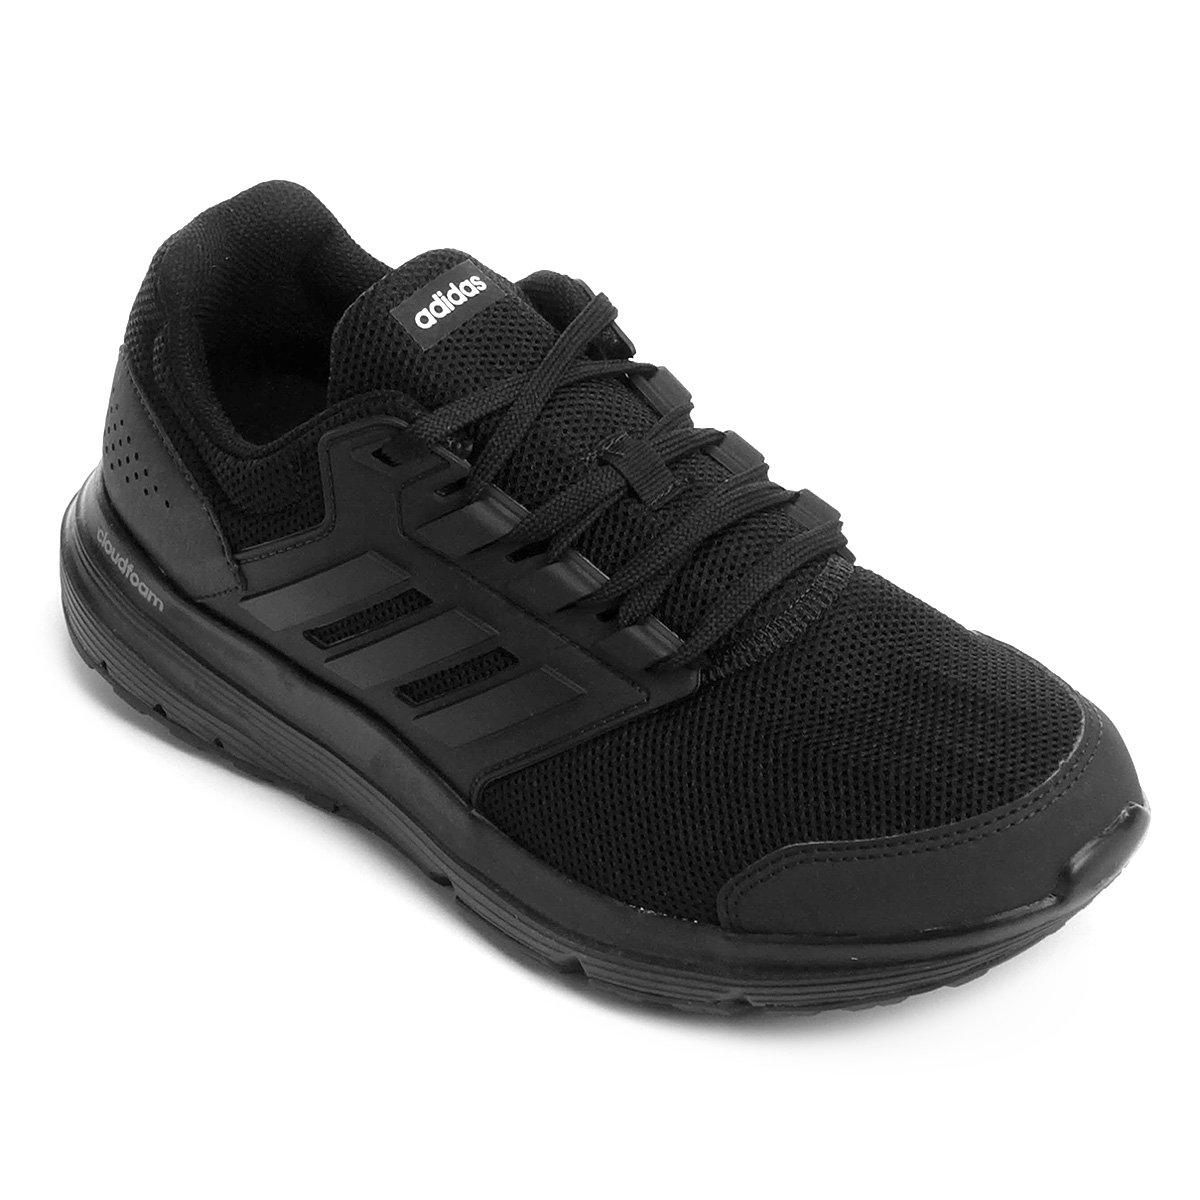 8b1073026 Tênis Adidas Galaxy 4 Masculino - Compre Agora